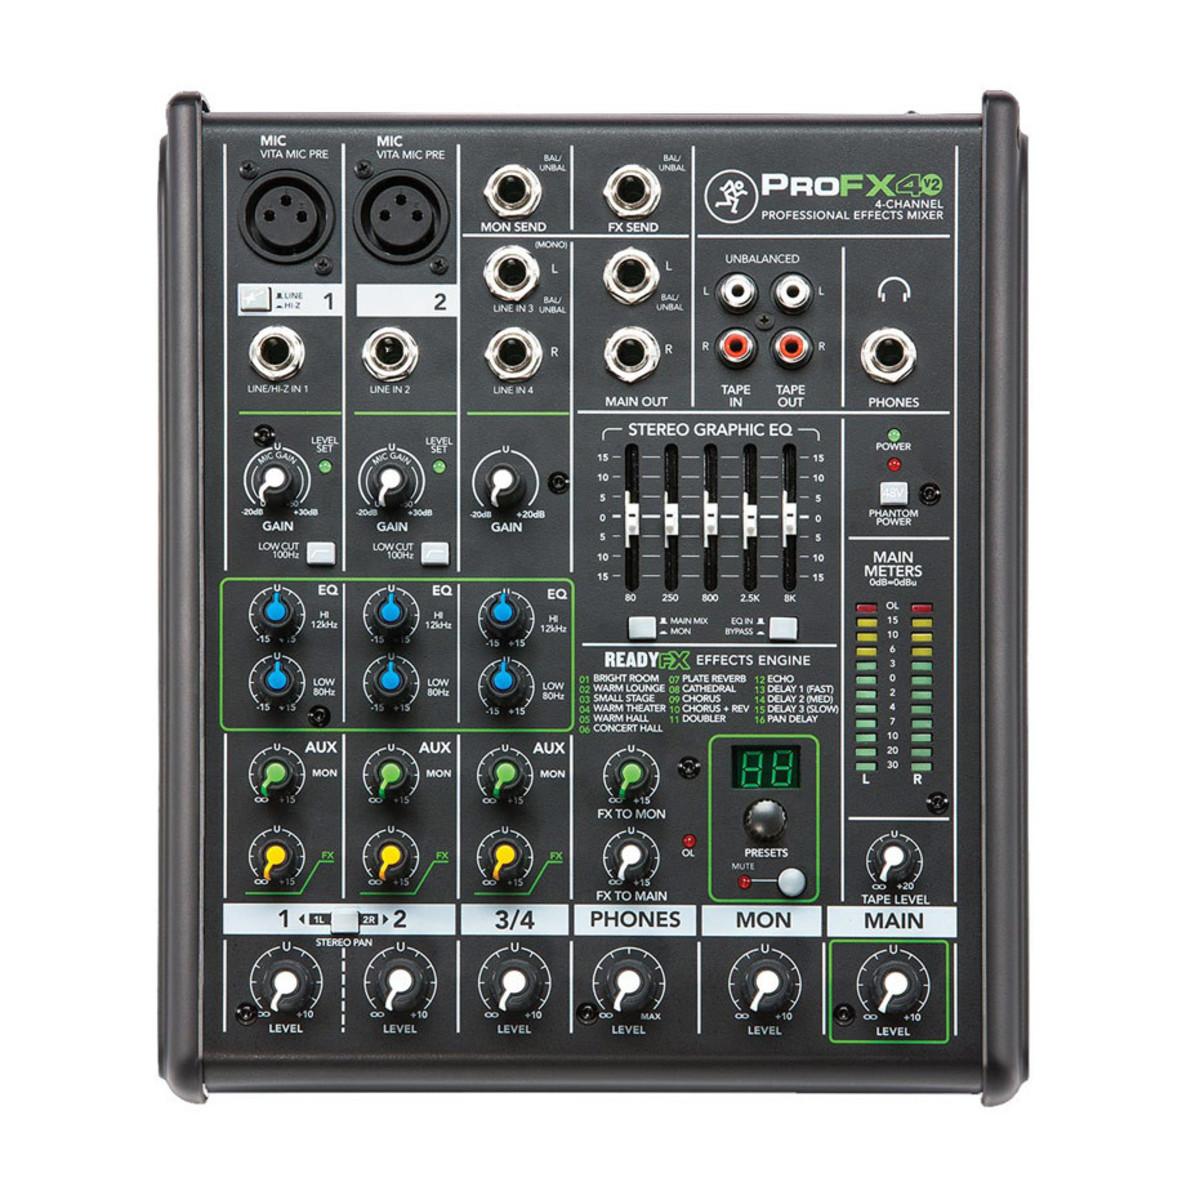 Table de mixage mackie profx4v2 4 canaux effets professionnels - Table de mixage professionnel ...